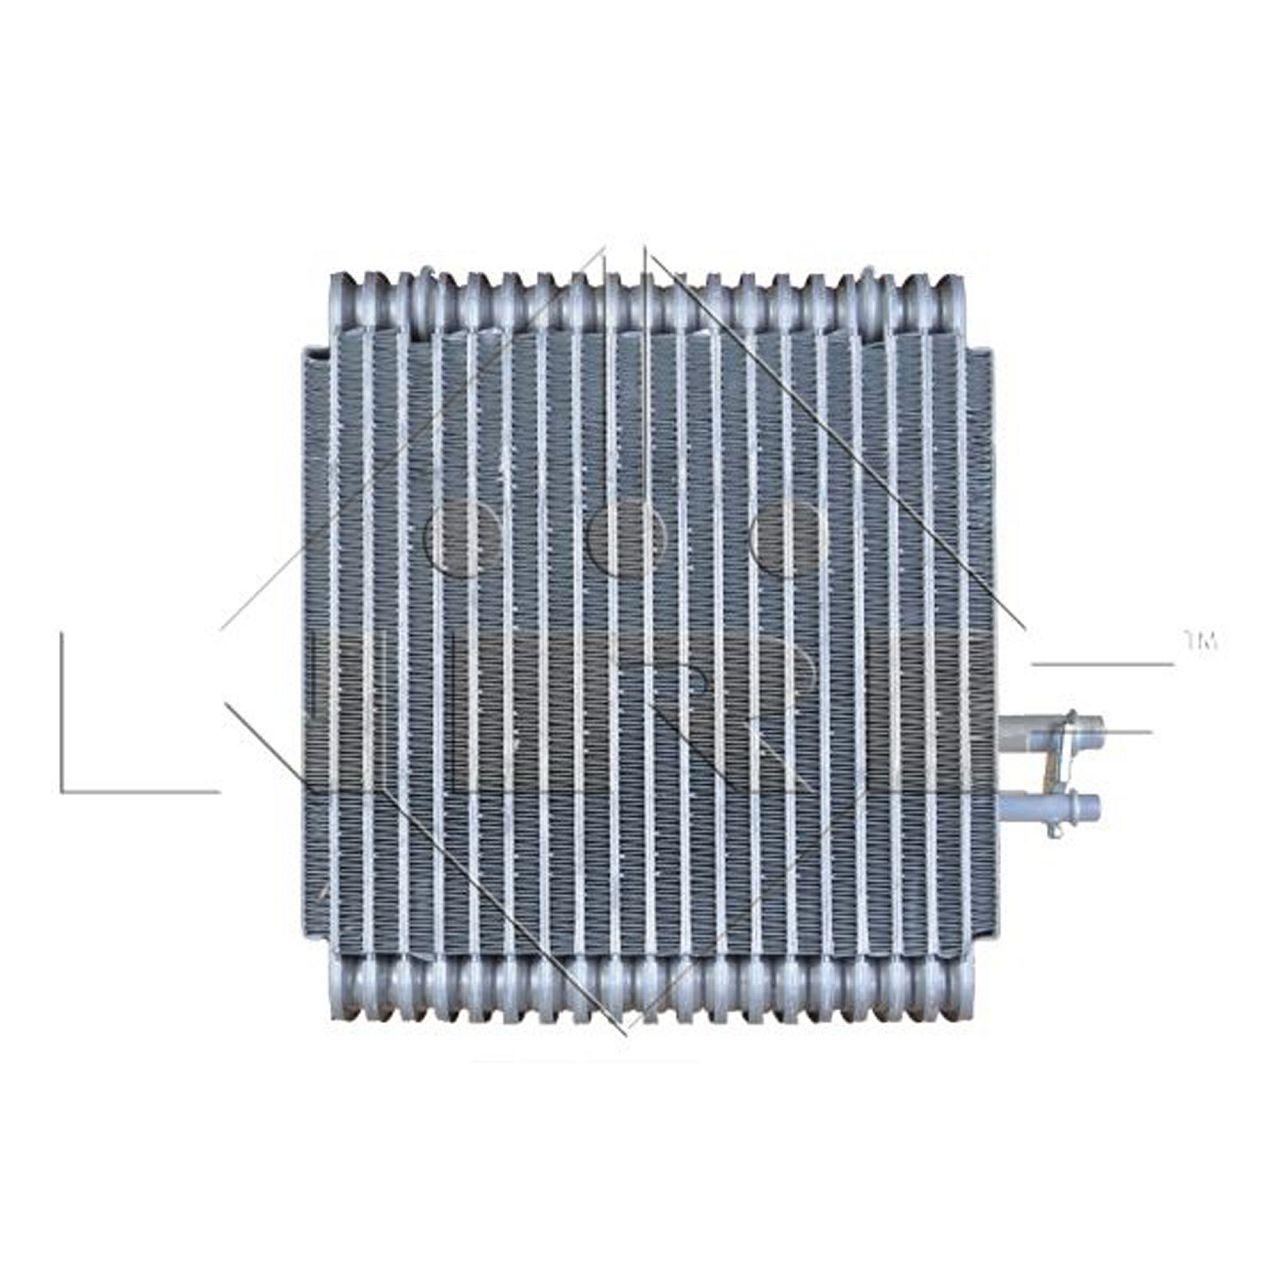 NRF Verdampfer Klimaanlage EASY FIT für FORD Galaxy WGR SEAT Alhambra 7V VW Sharan 7M